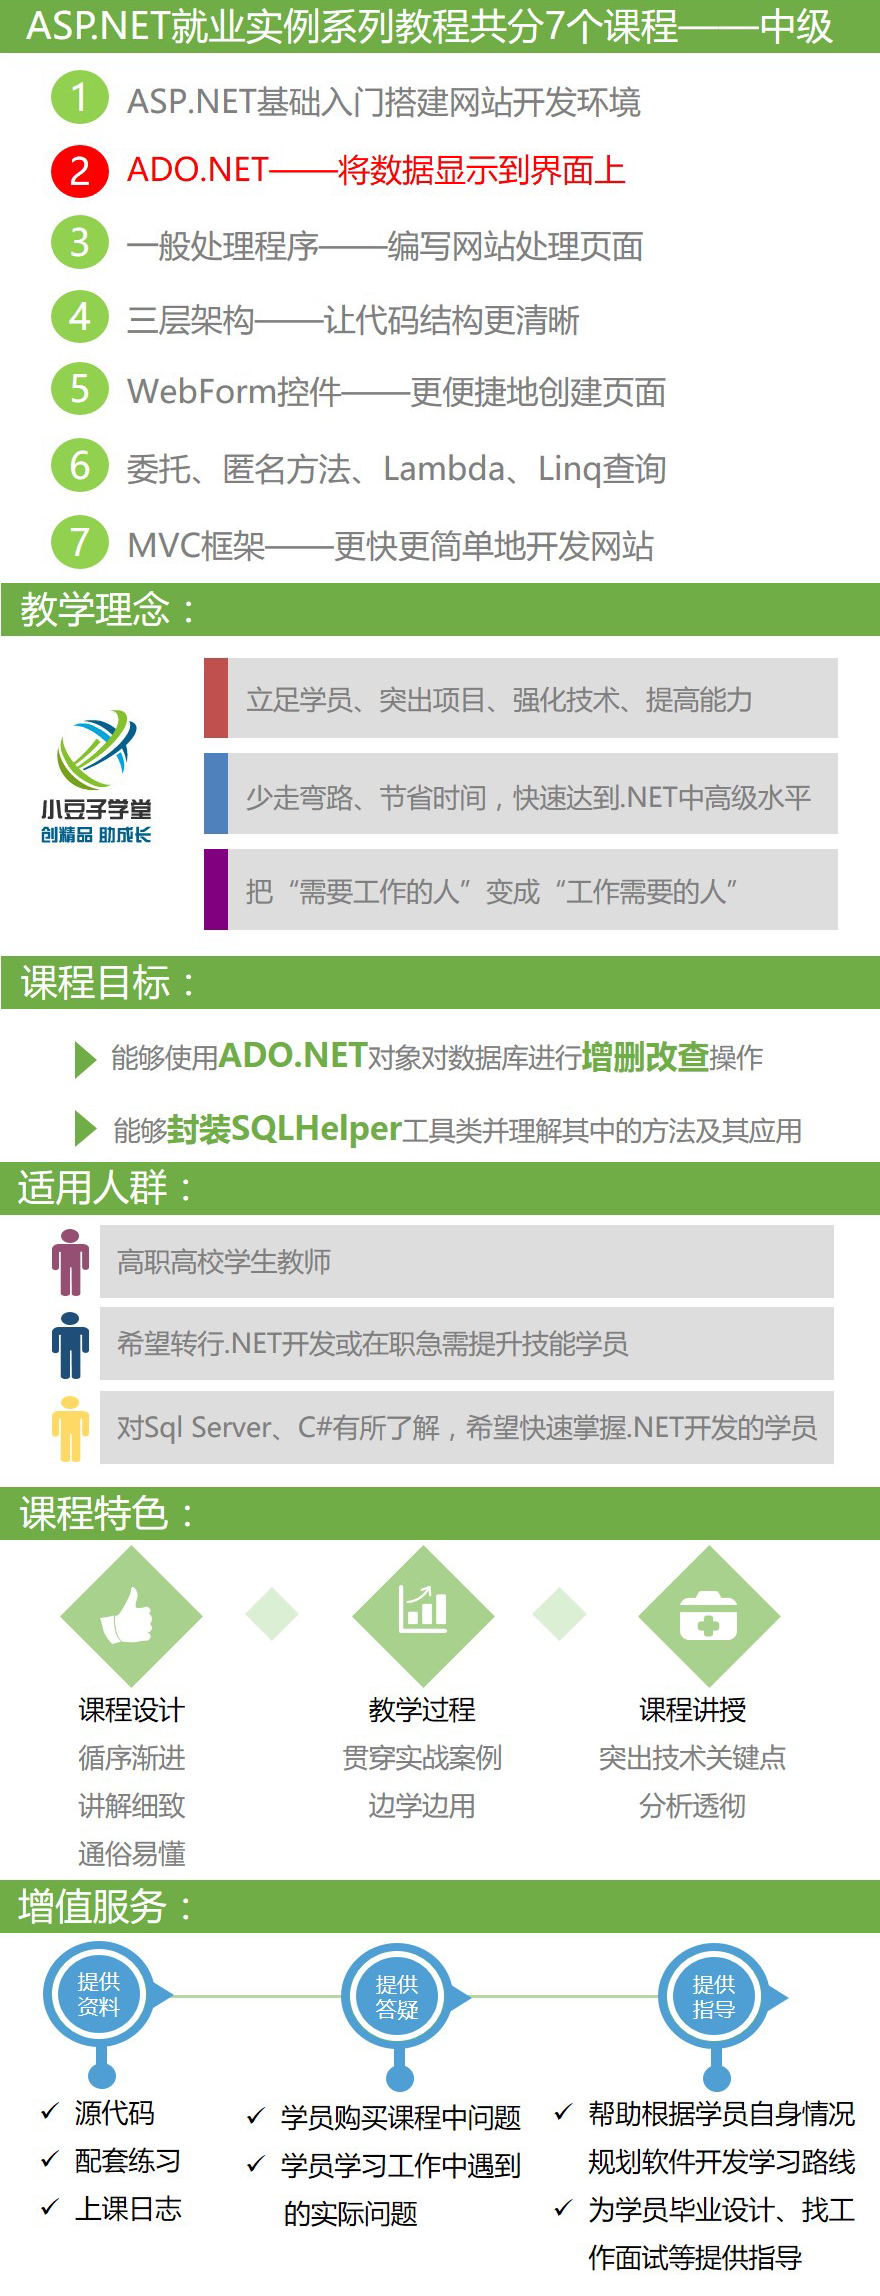 2 ADO.NET 1.png